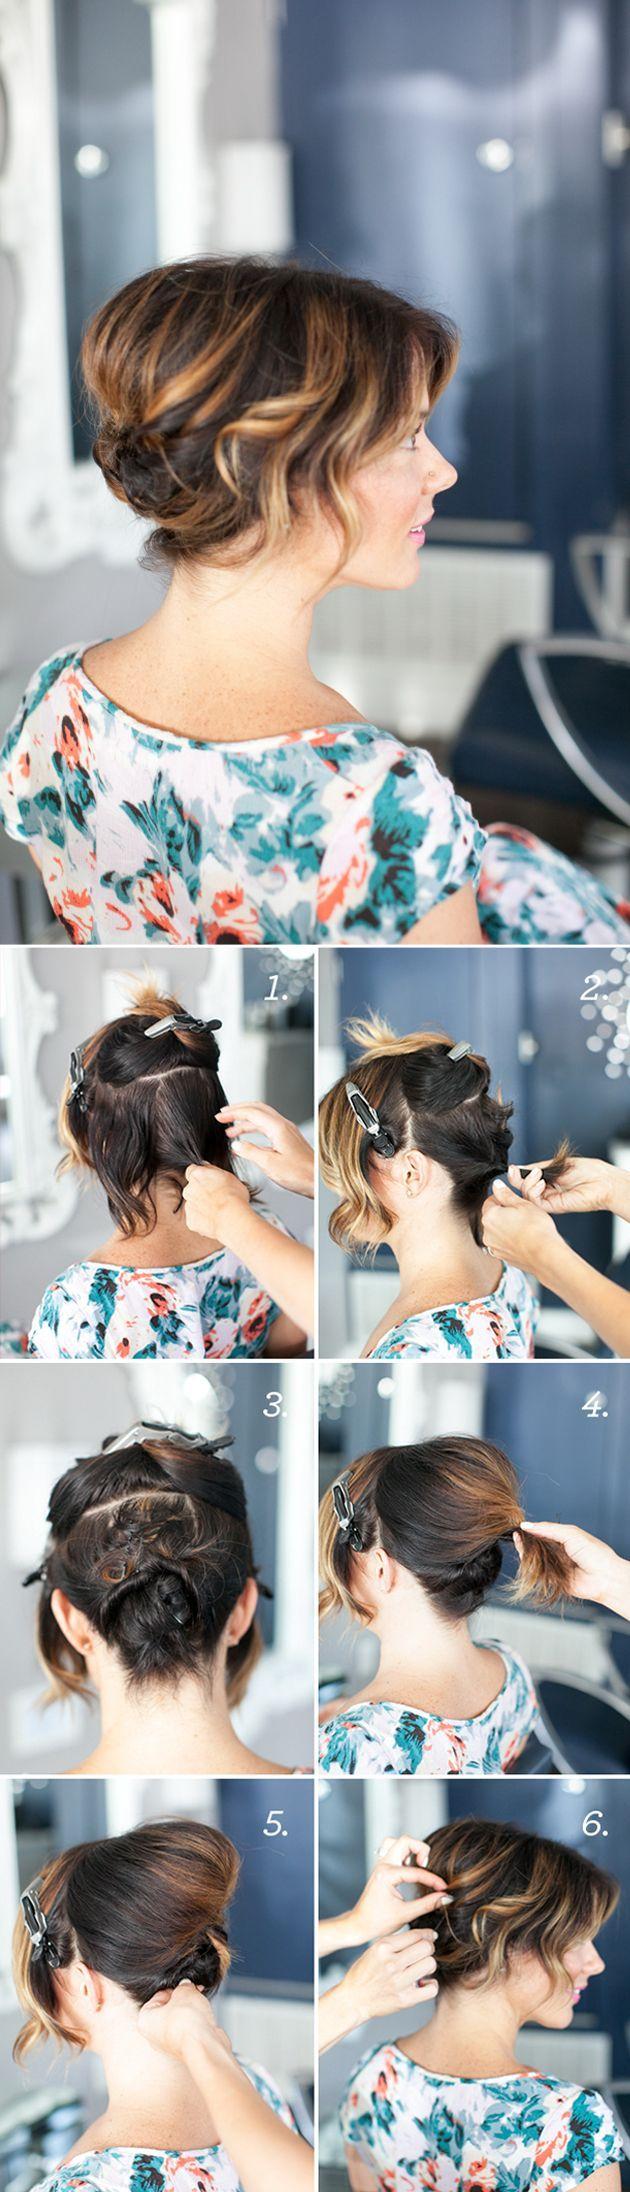 20 Creative Short Wedding Hairstyles for Brides